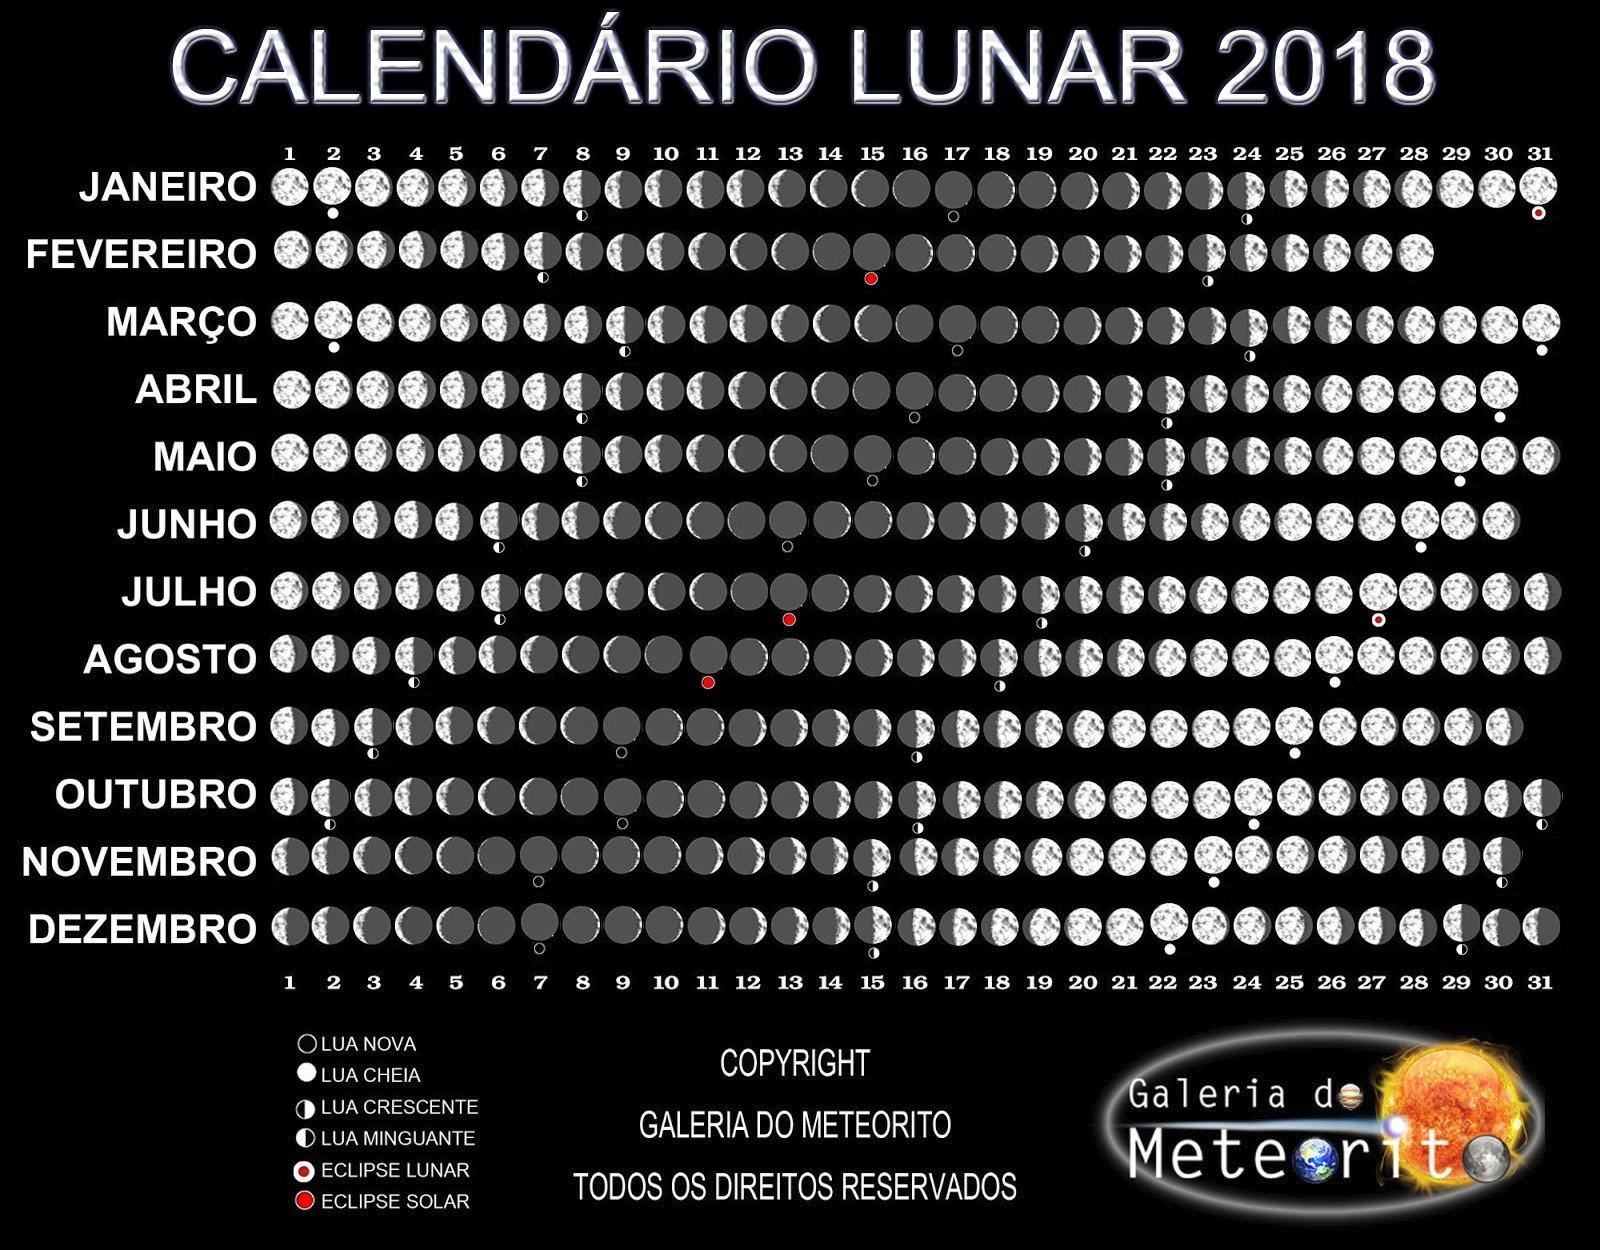 calend225rio lunar galeria do meteorito